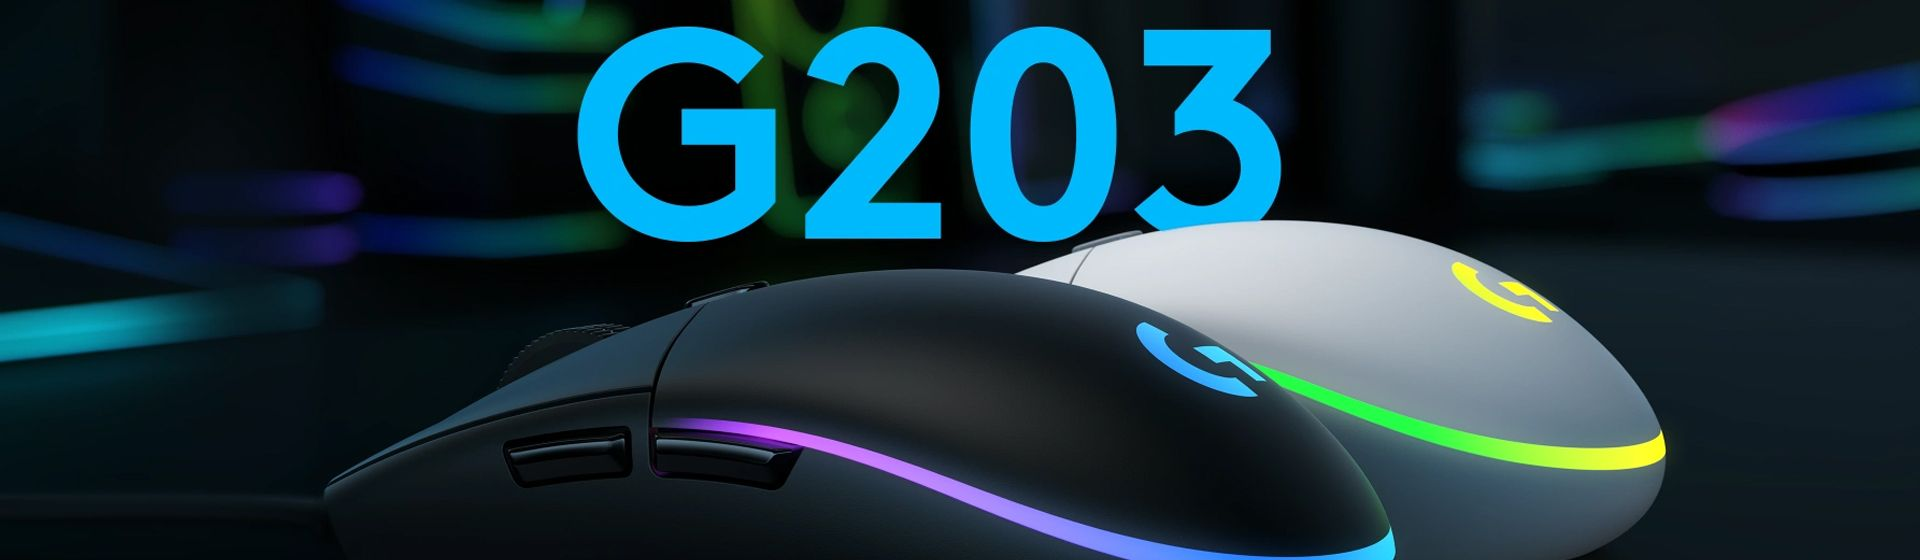 Logitech lança mouse gamer G203 LIGHTSYNC no Brasil; veja preço